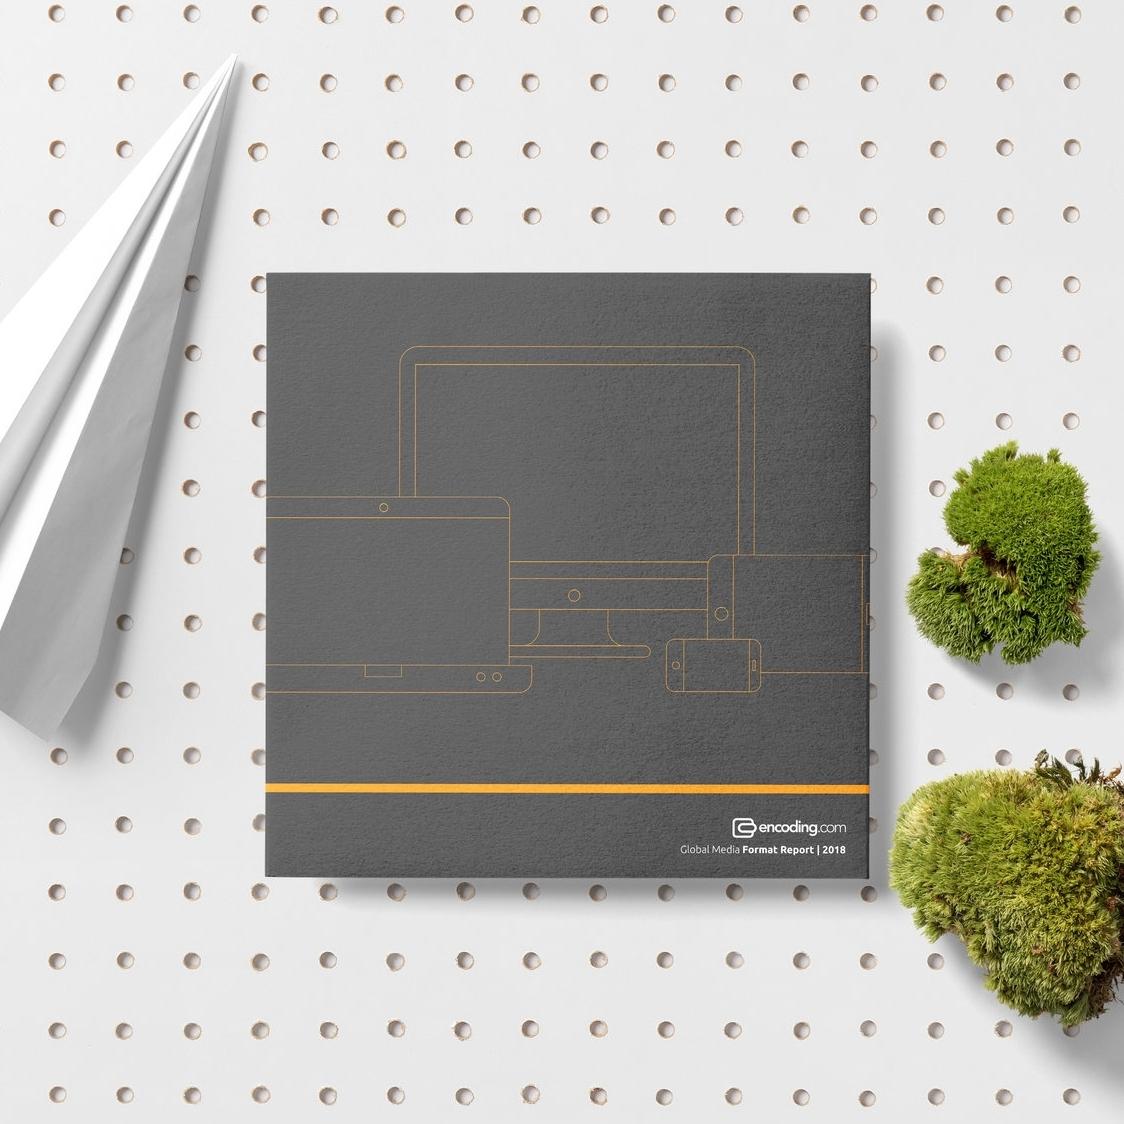 erica simon tiny hammer graphic design